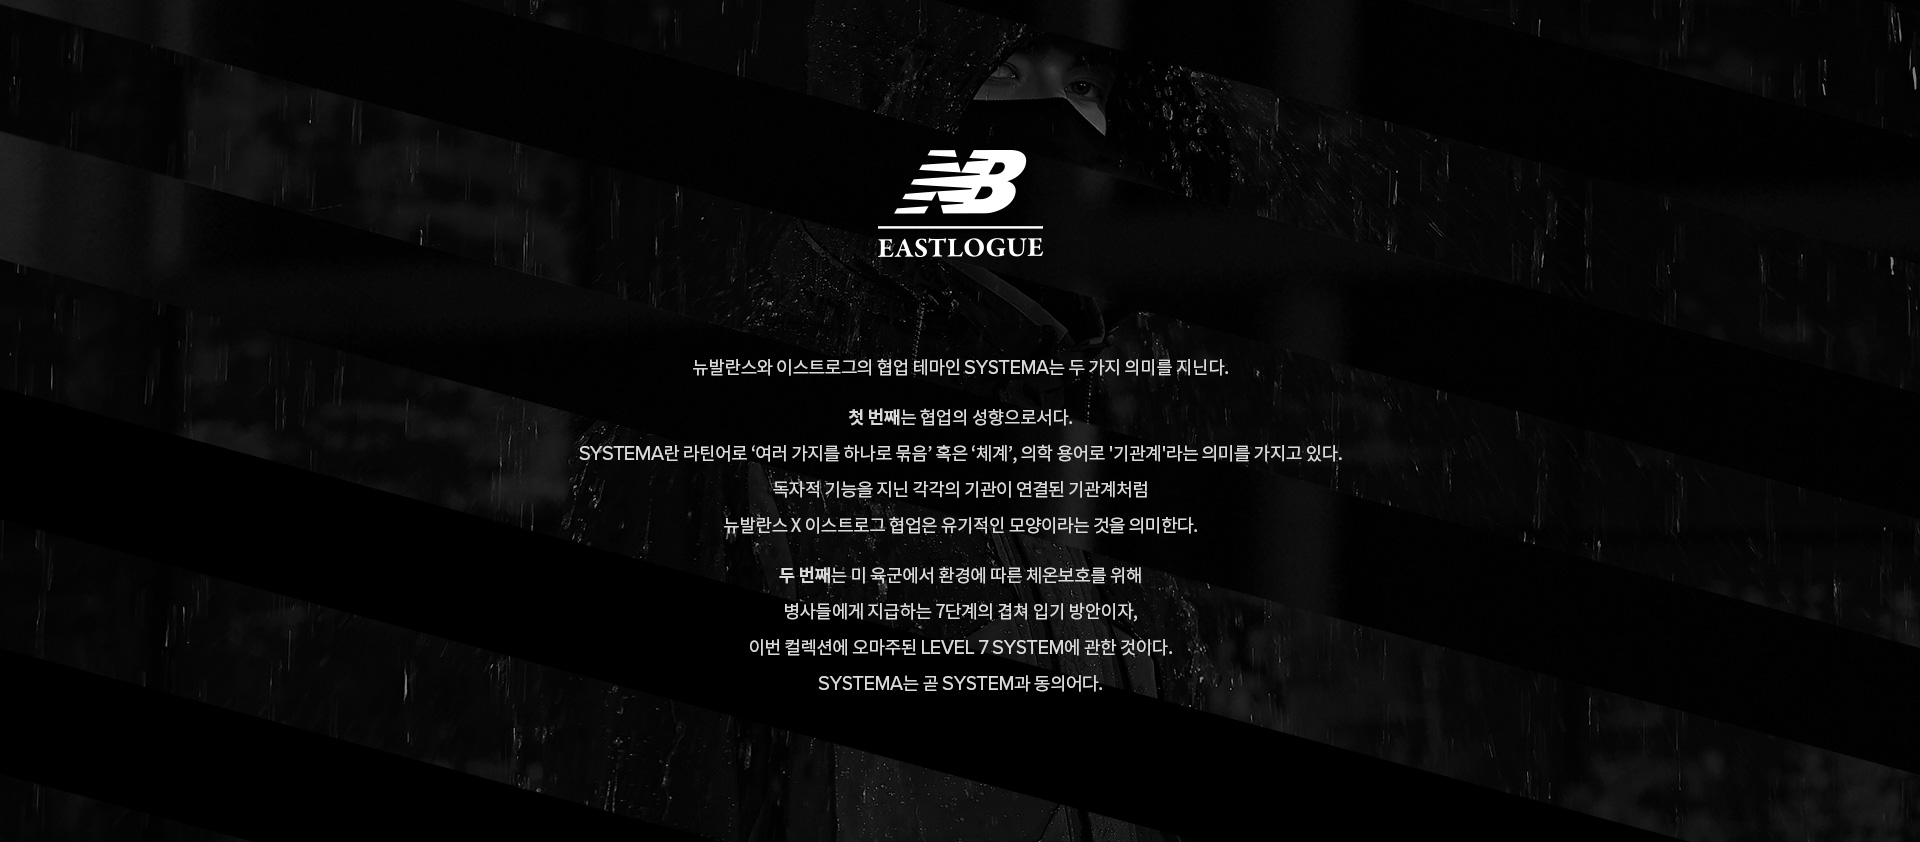 eastlogue